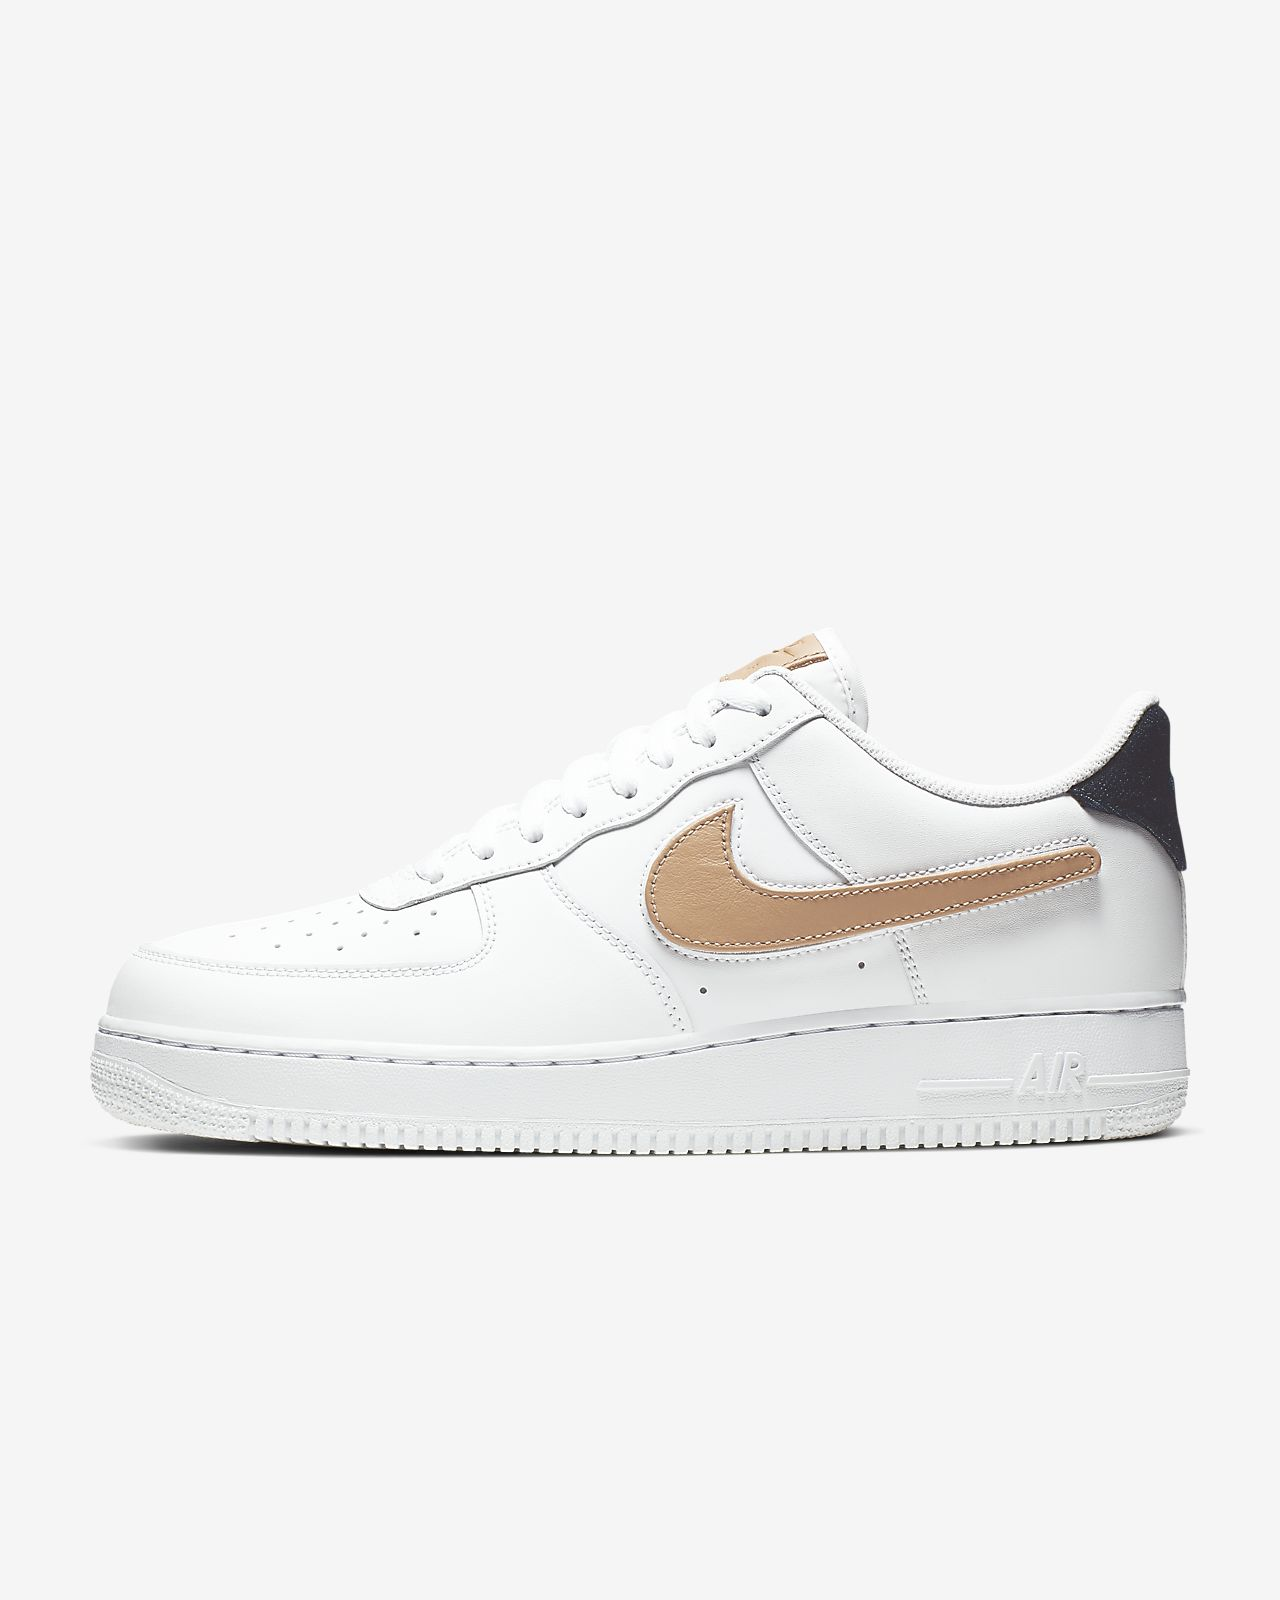 Nike Air Force 1 '07 LV8 3 (avtakbar Swoosh) herresko